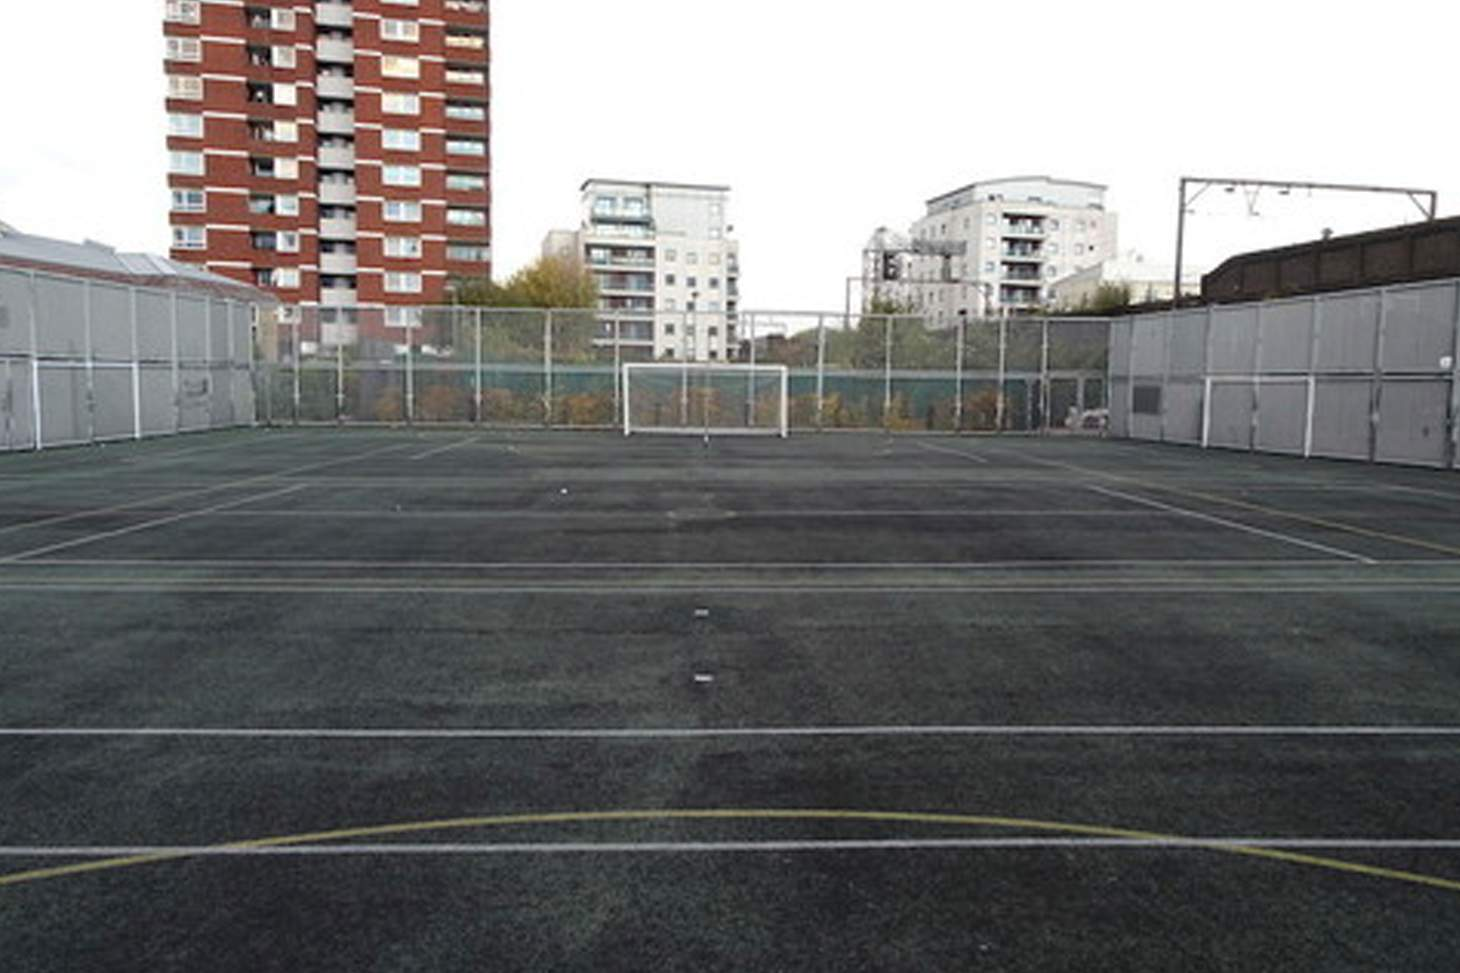 Bishop Challoner Catholic Federation of Schools Court | Hard (macadam) tennis court